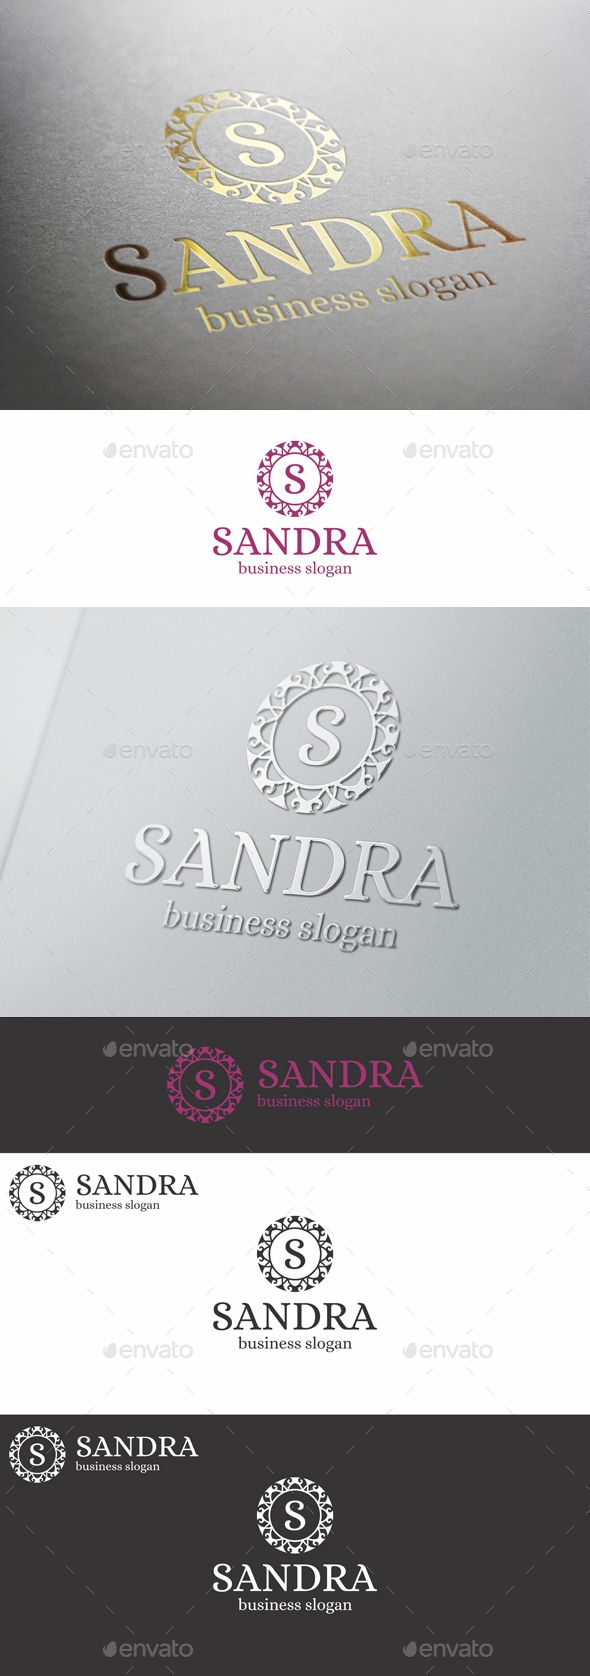 Boutique Badge Logo Emblem  Sandra — Vector EPS #ornament #vintage • Available here → https://graphicriver.net/item/boutique-badge-logo-emblem-sandra/13080987?ref=pxcr